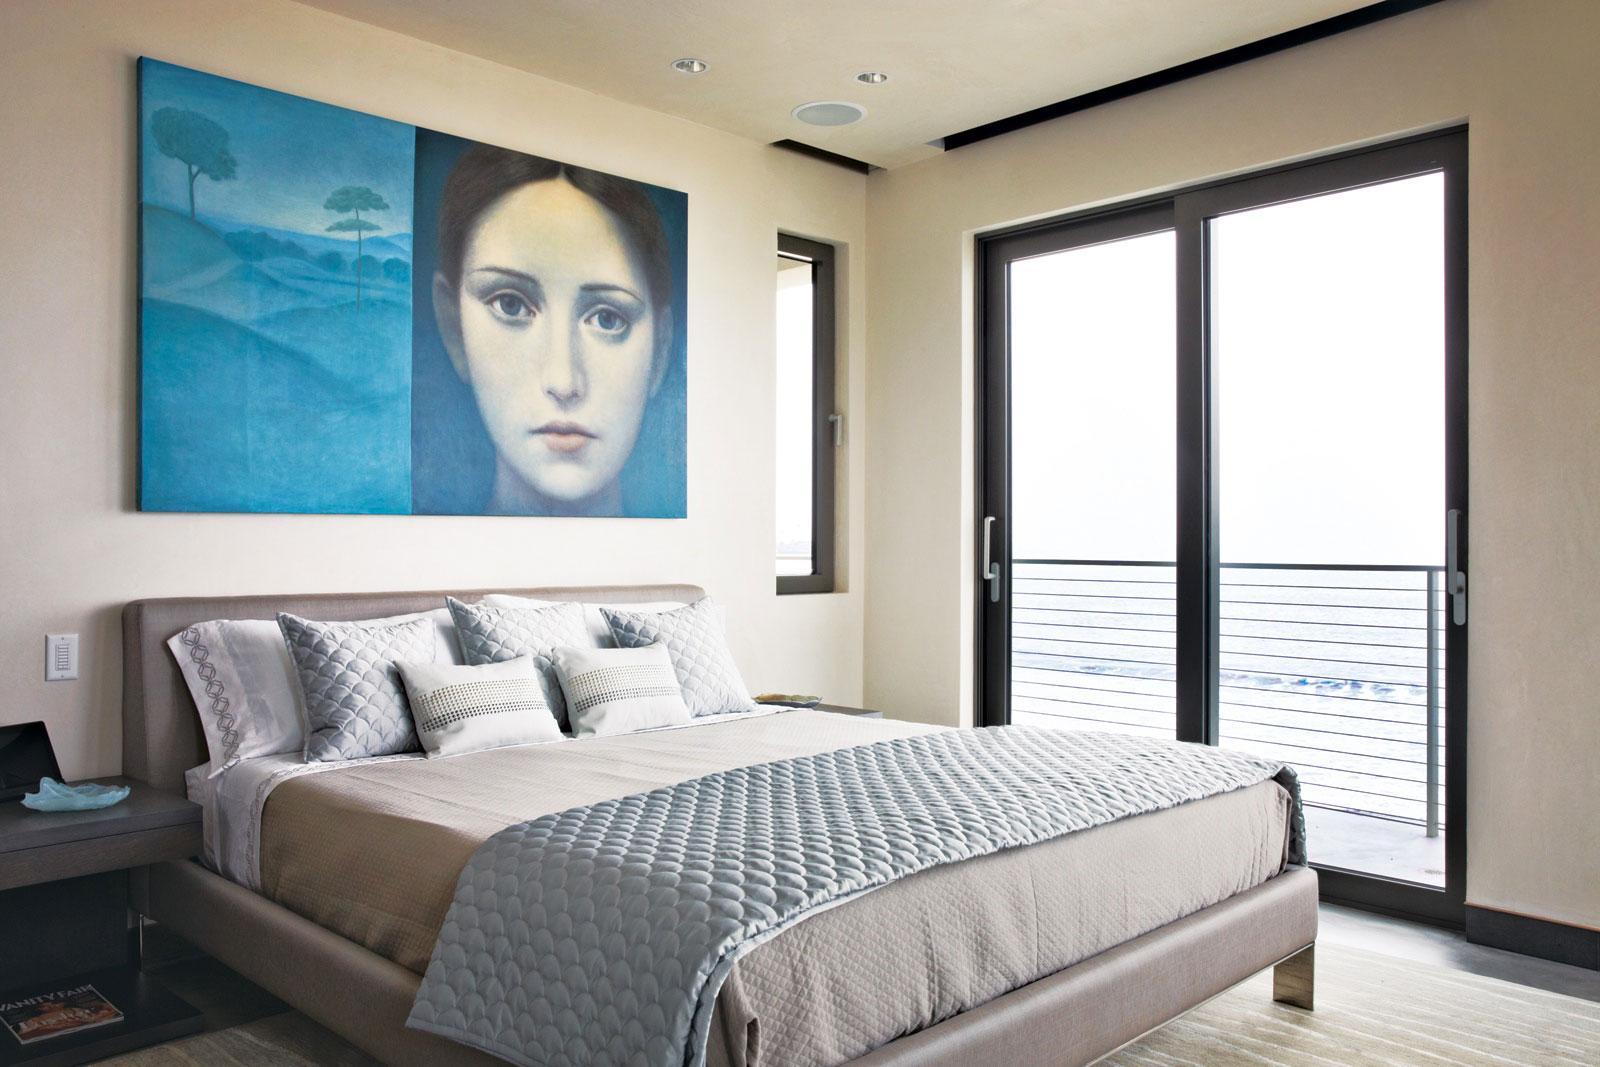 Bedroom, Art, Glass Sliding Doors, Balcony, Eco-Friendly Beach House in California